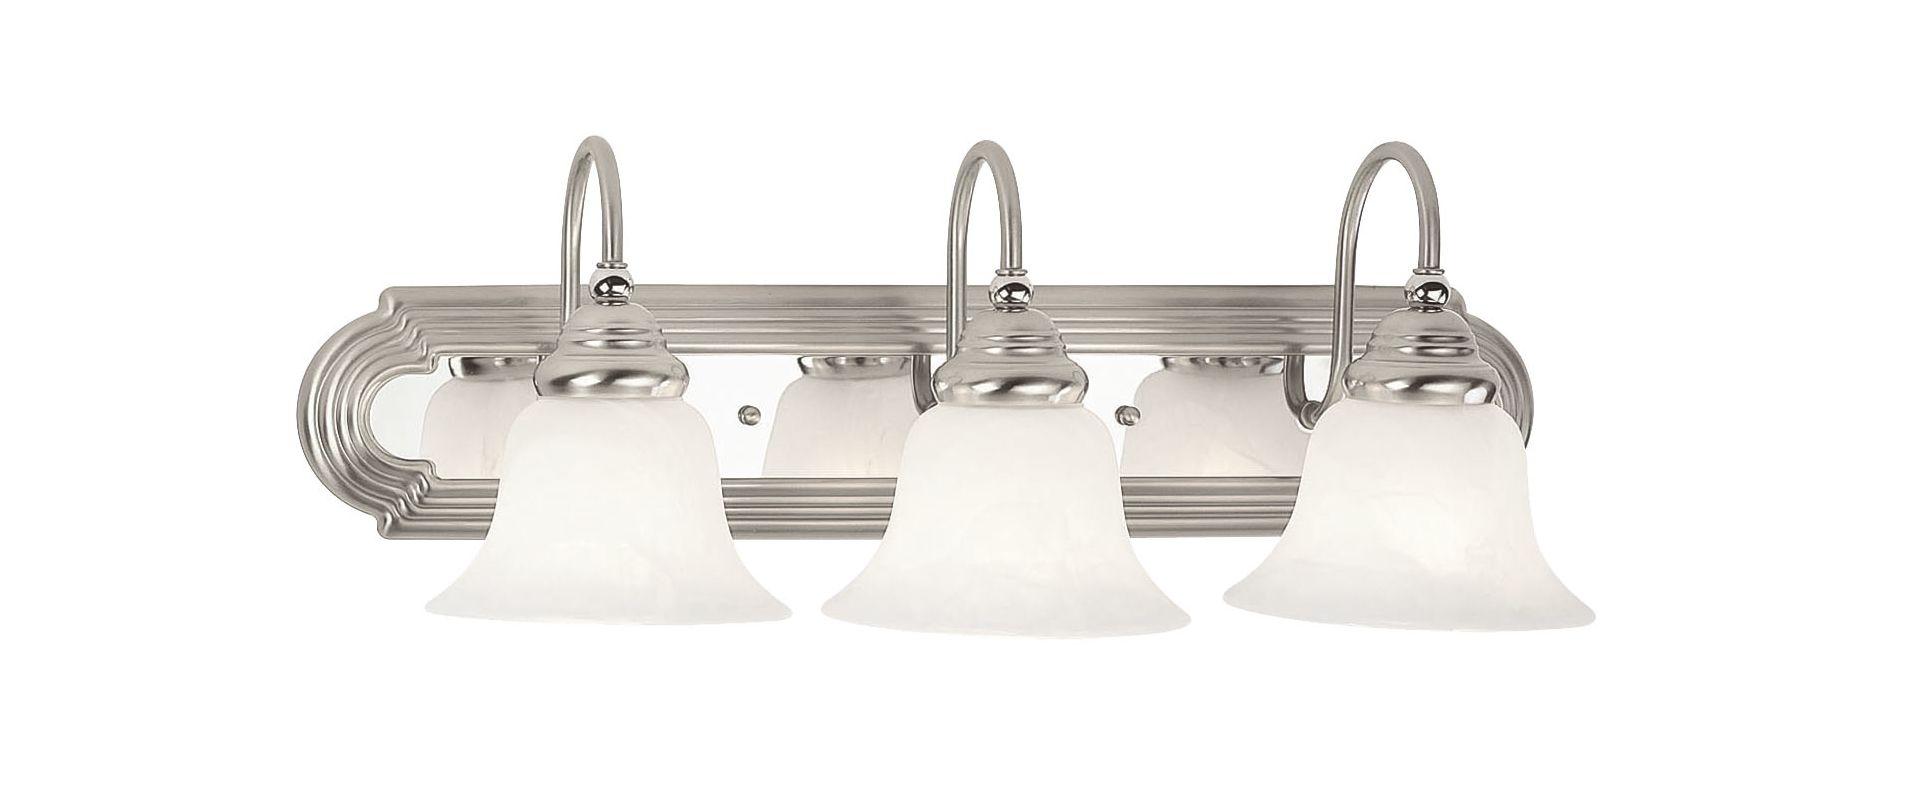 Livex Lighting 1003 Belmont 3 Light Vanity Light Brushed Nickel/Chrome Sale $143.91 ITEM: bci1033255 ID#:1003-95 UPC: 847284007314 :